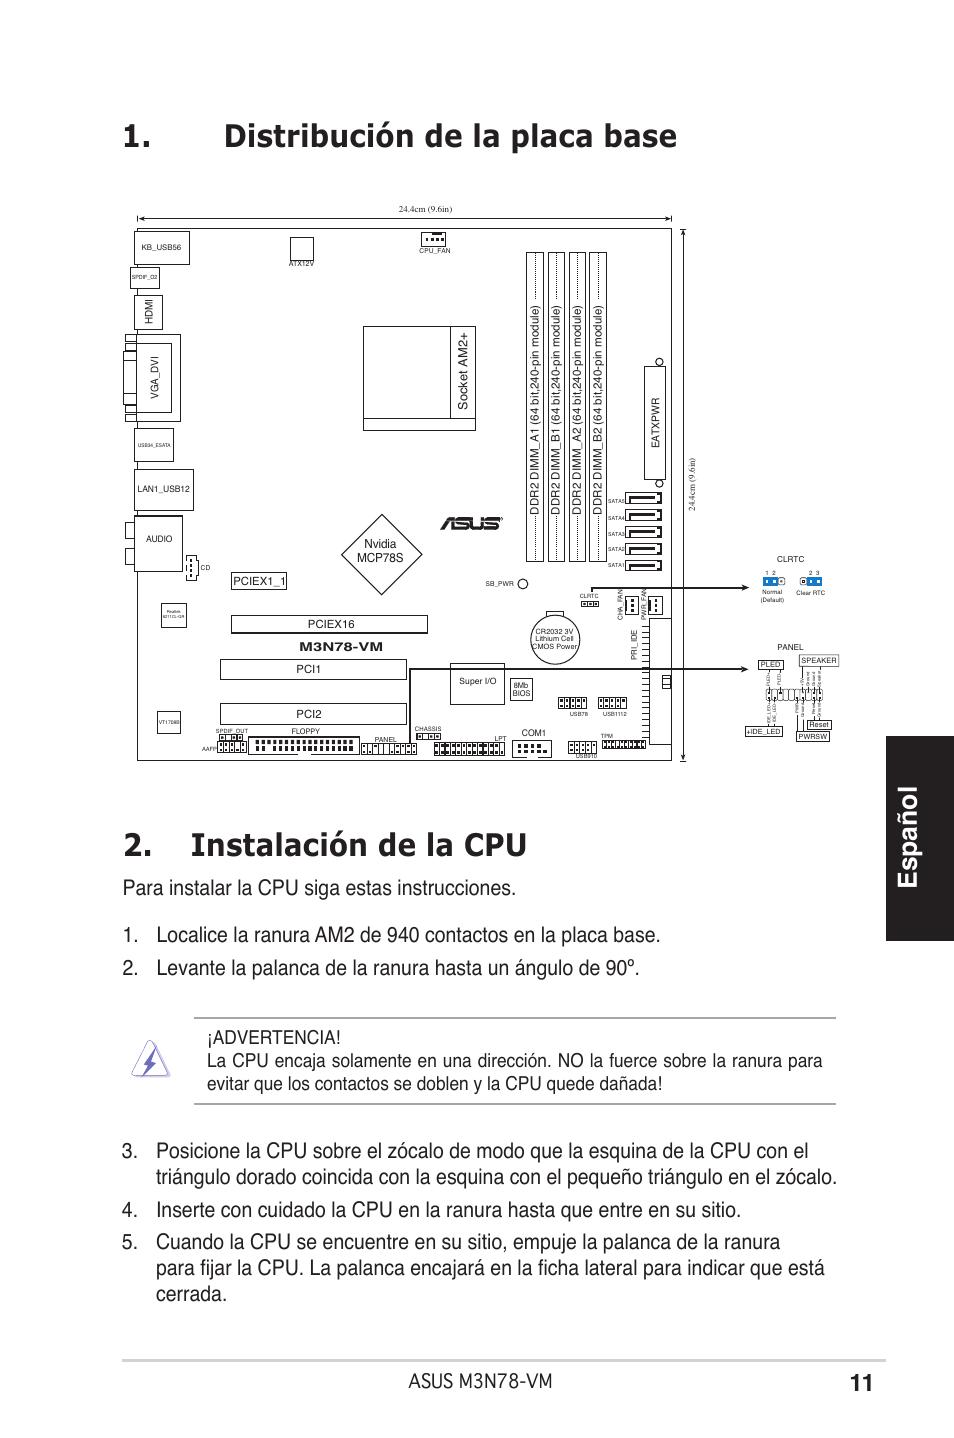 asus m3n78 vm page11 espa�ol, asus m3n78 vm asus m3n78 vm user manual page 11 38 VMware View Diagram at aneh.co